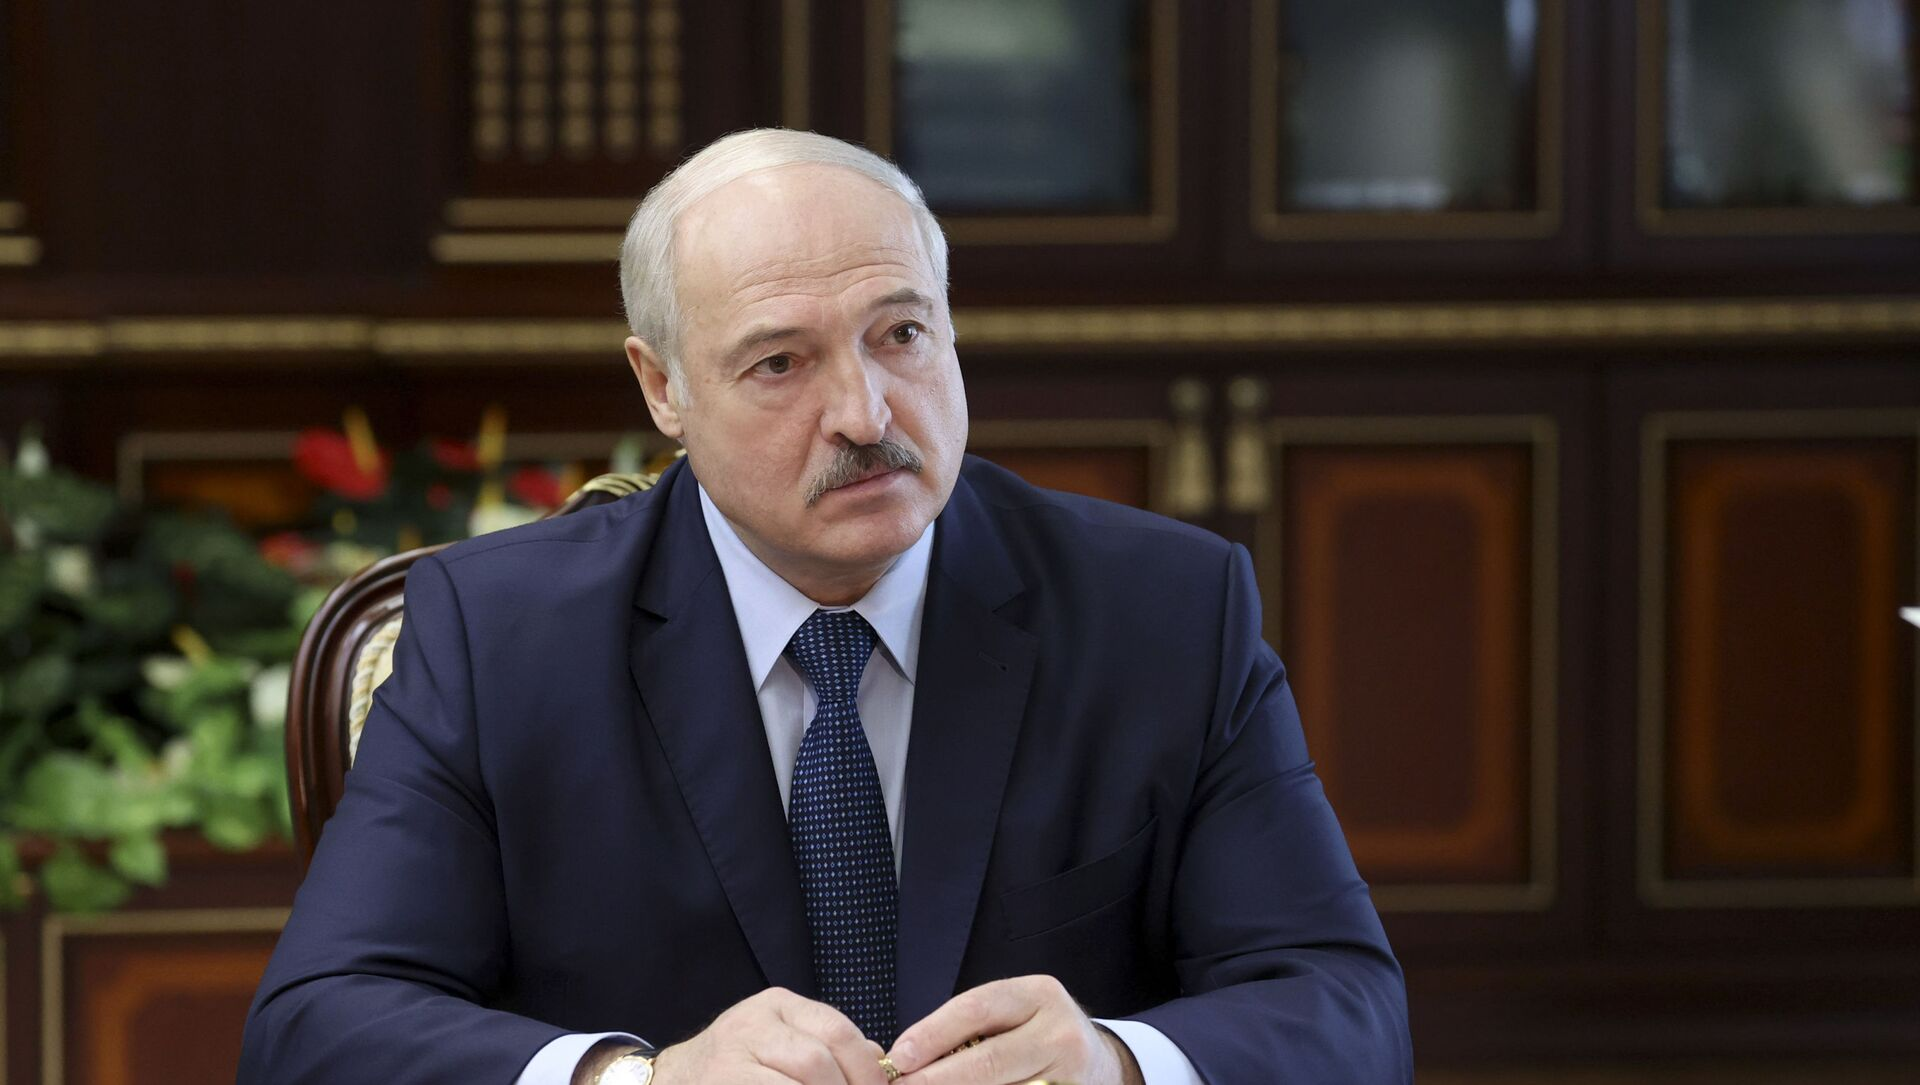 Президент Белоруссии Александр Лукашенко, фото из архива - Sputnik Азербайджан, 1920, 06.04.2021